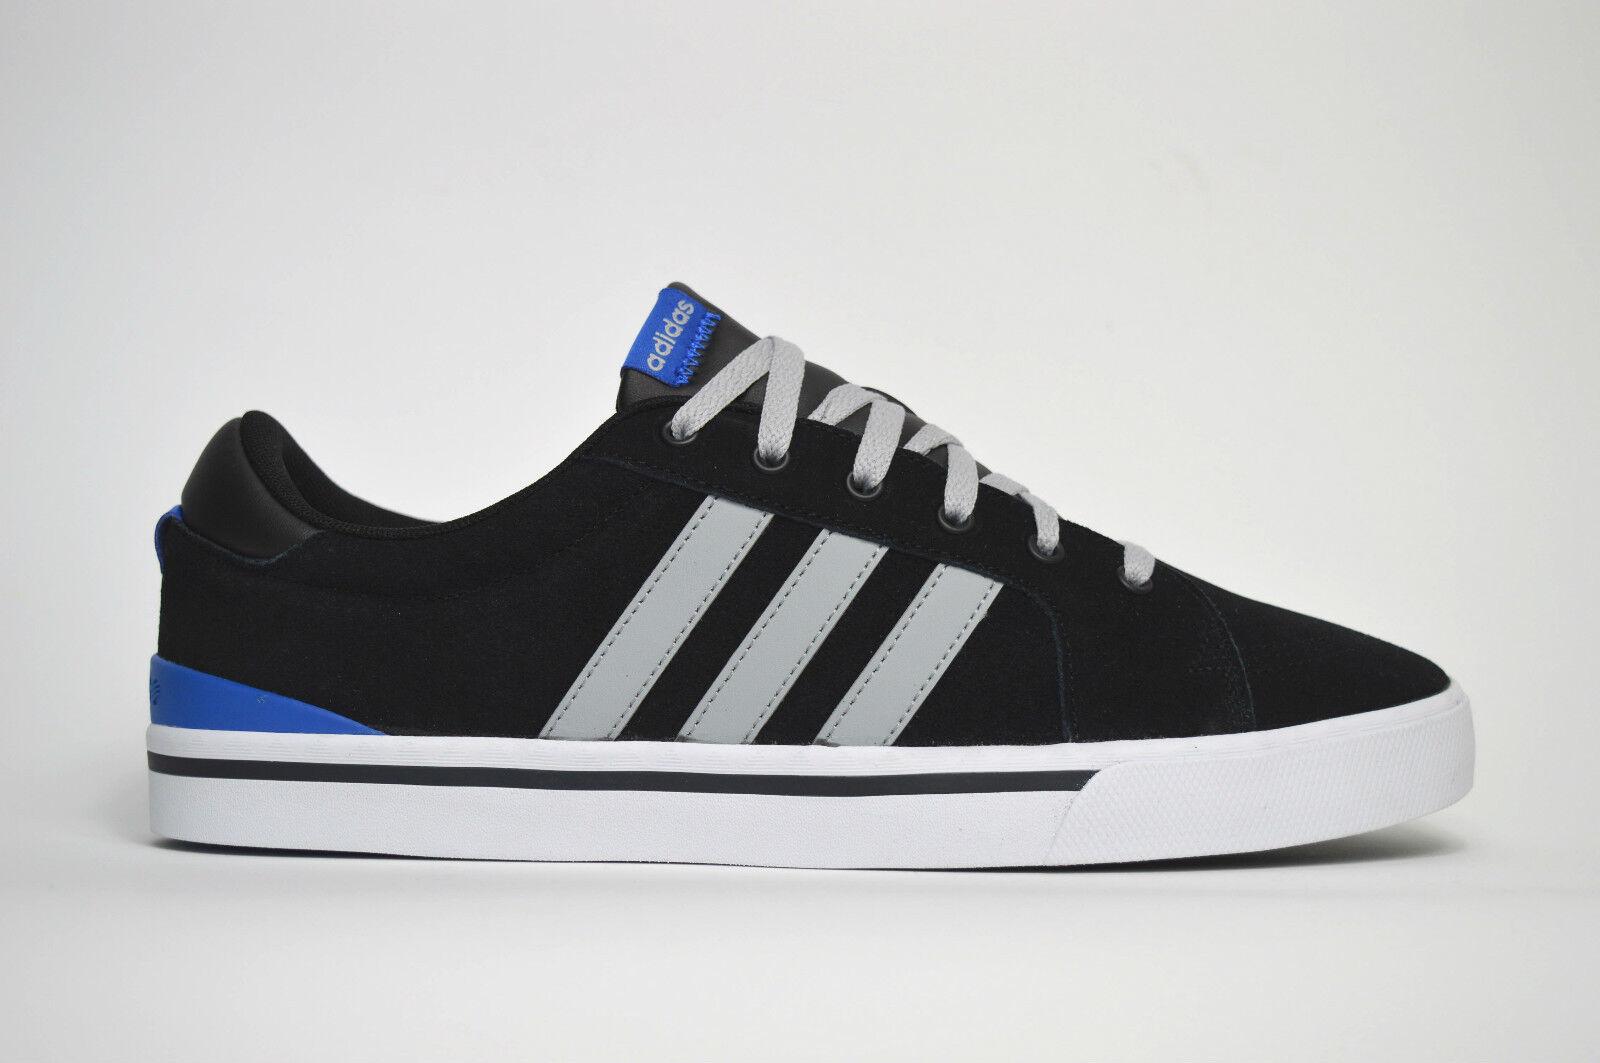 Adidas Park ST NEU Sneaker schwarz black skate sb atmos patta max